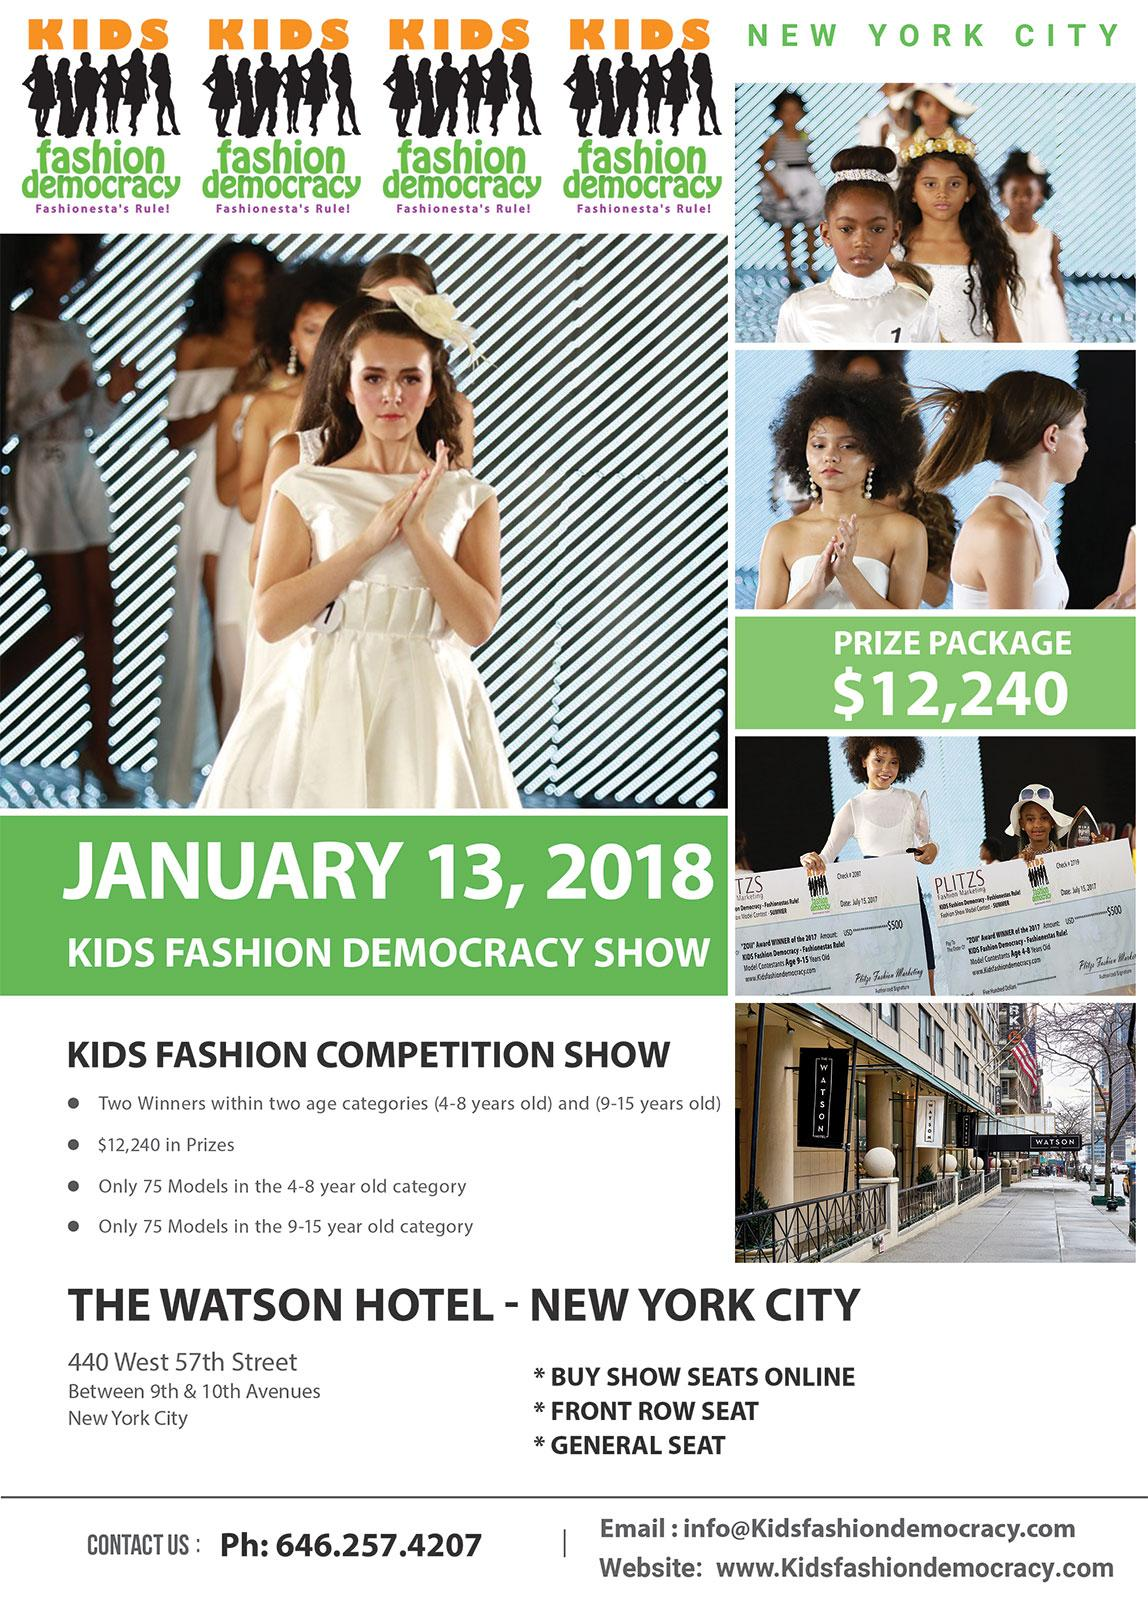 Aspiring Fashion Photographers & Videographers for KIDS Fashion Show in New York